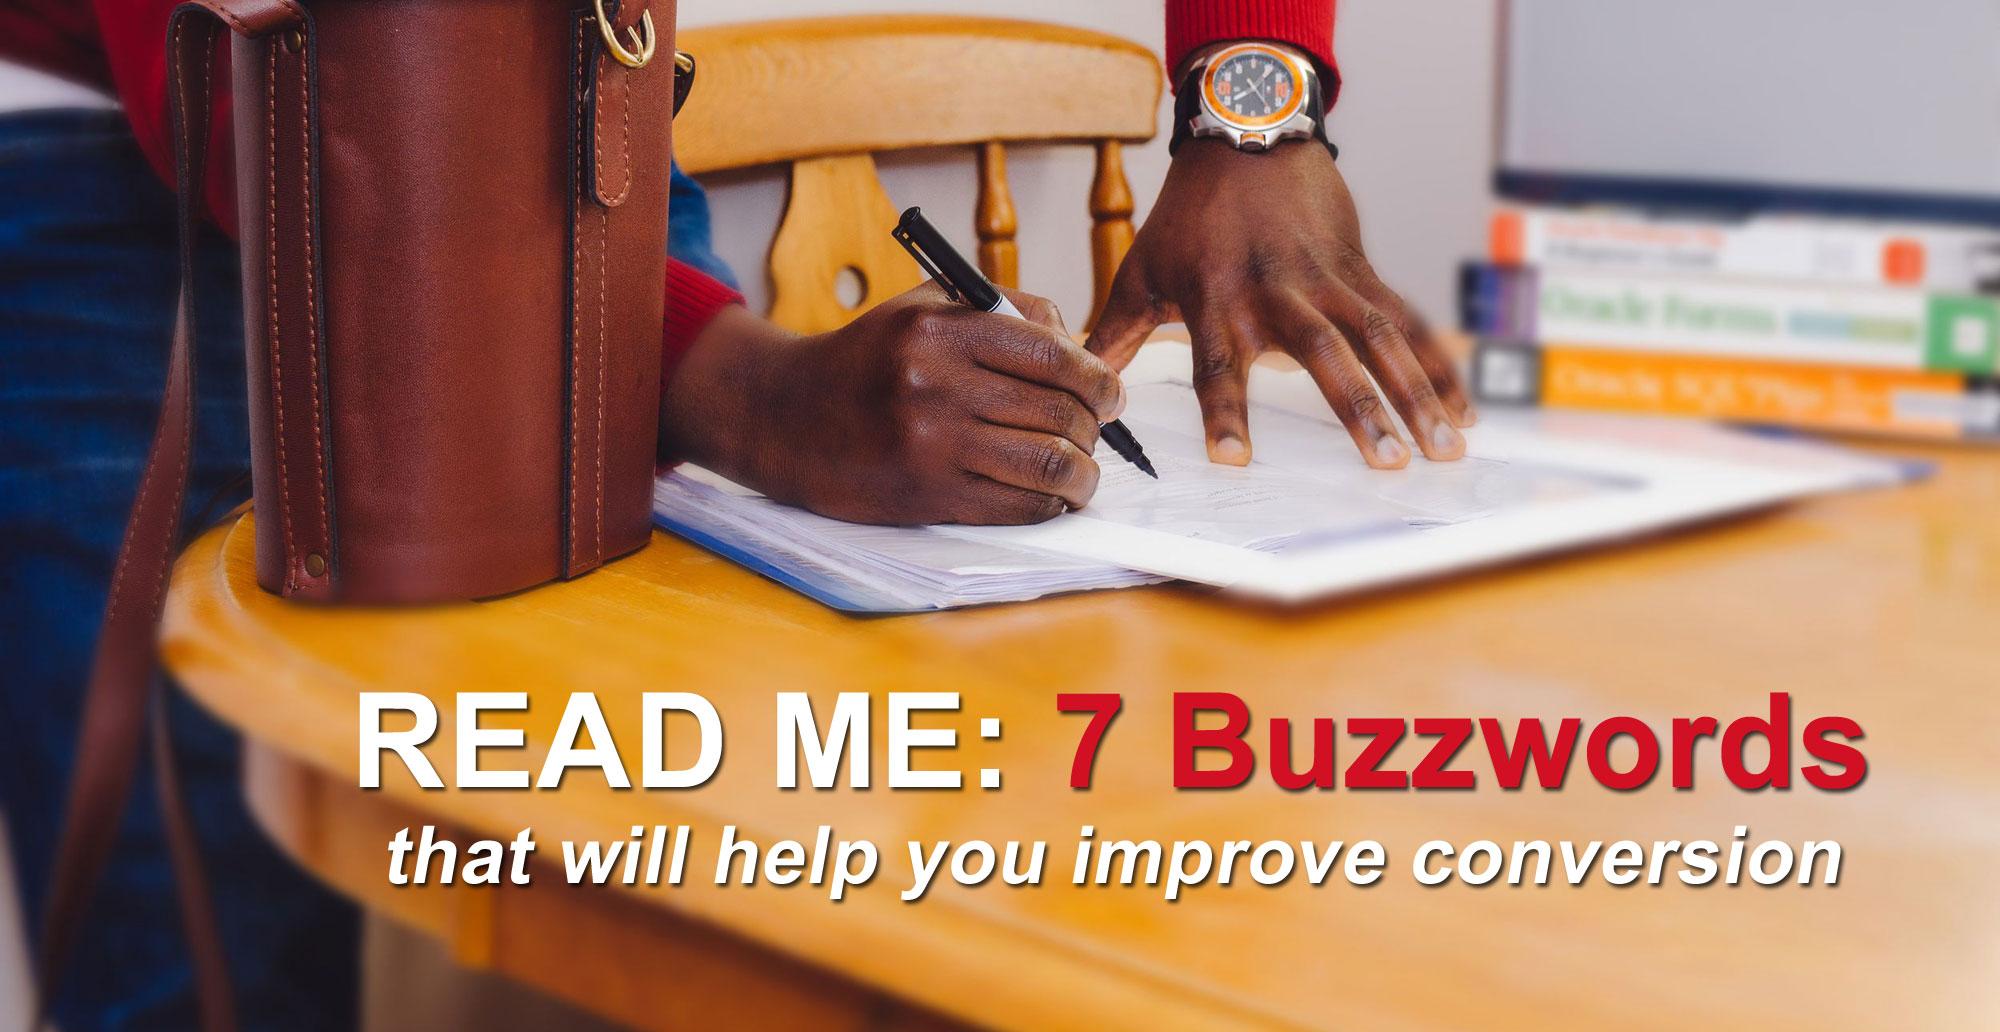 buzzwords improve conversion